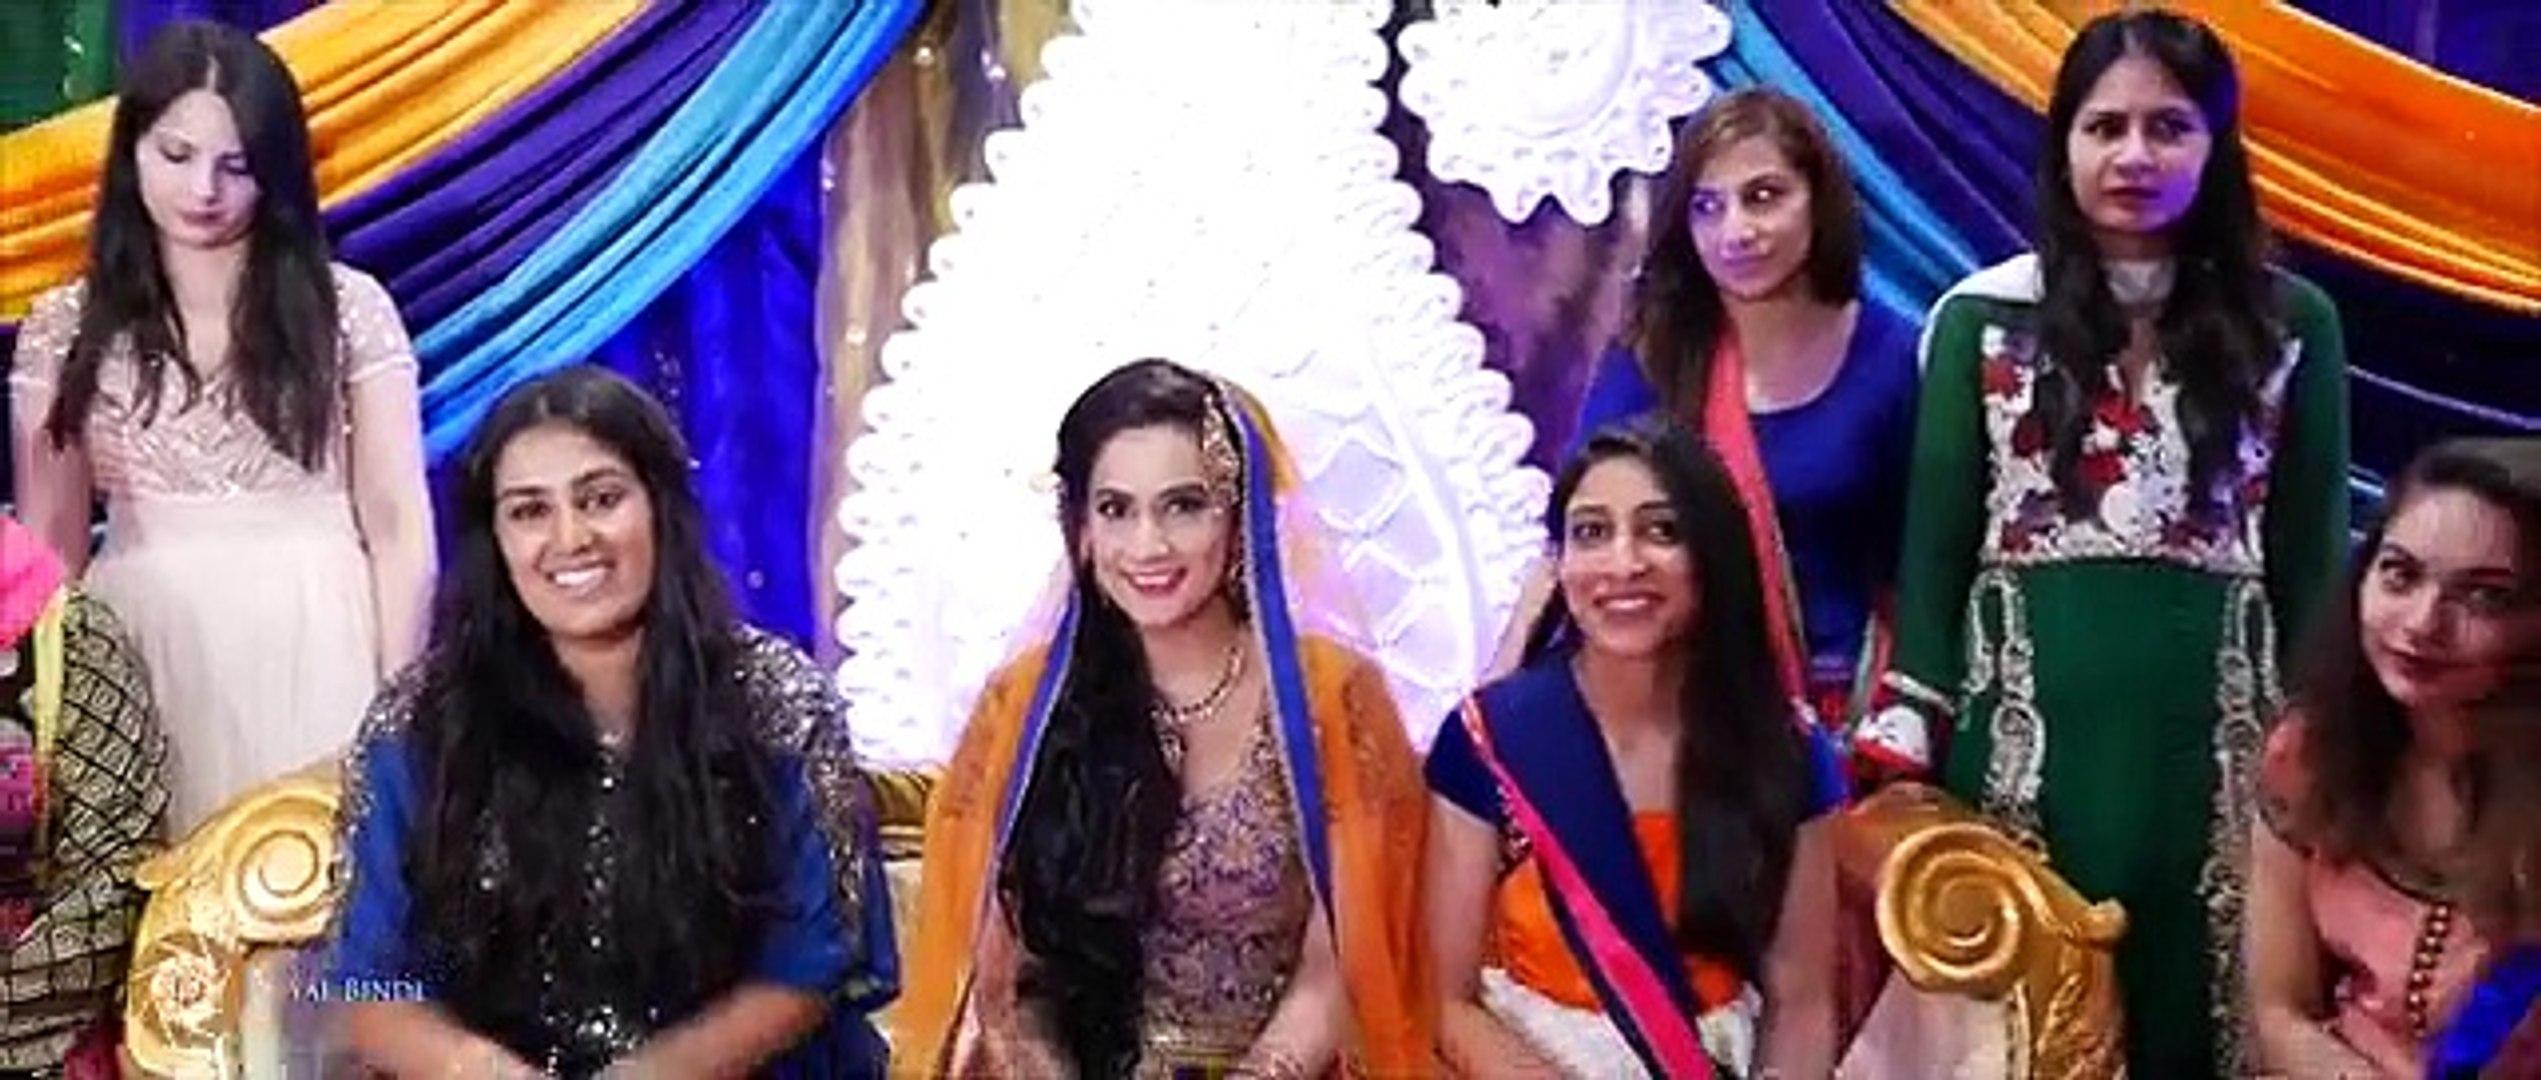 Best Indian Wedding Trailer - London, UK - The Decorium, Woodgreen